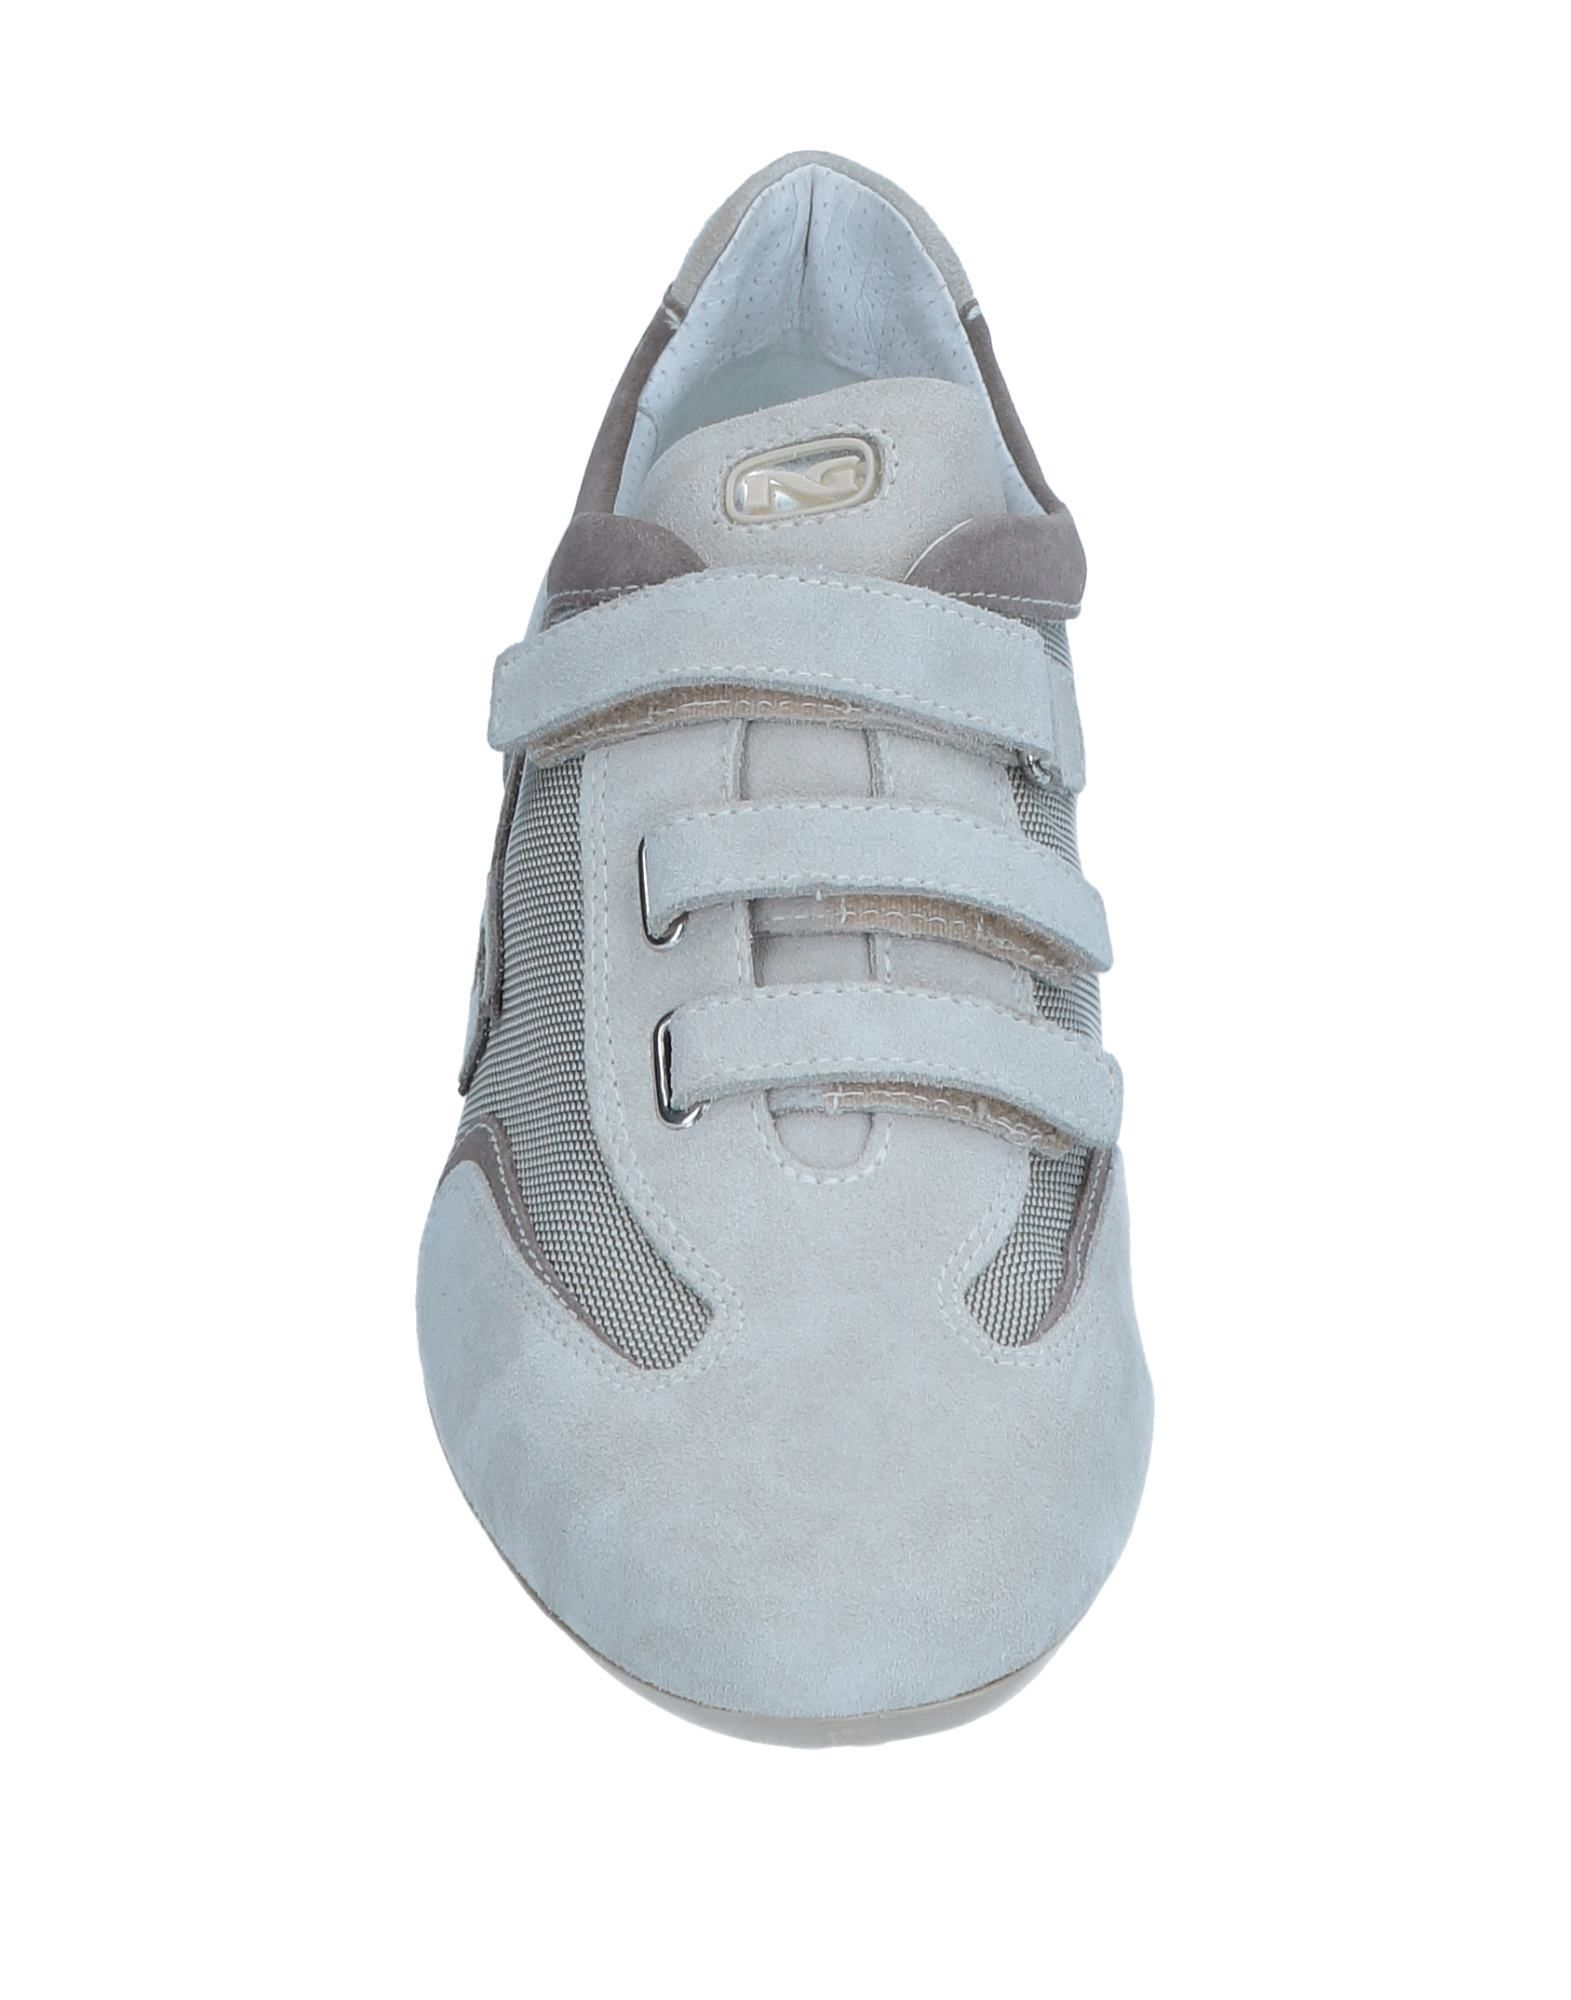 Ng Nero Giardini Gute Sneakers Damen  11548823QP Gute Giardini Qualität beliebte Schuhe 665ebf